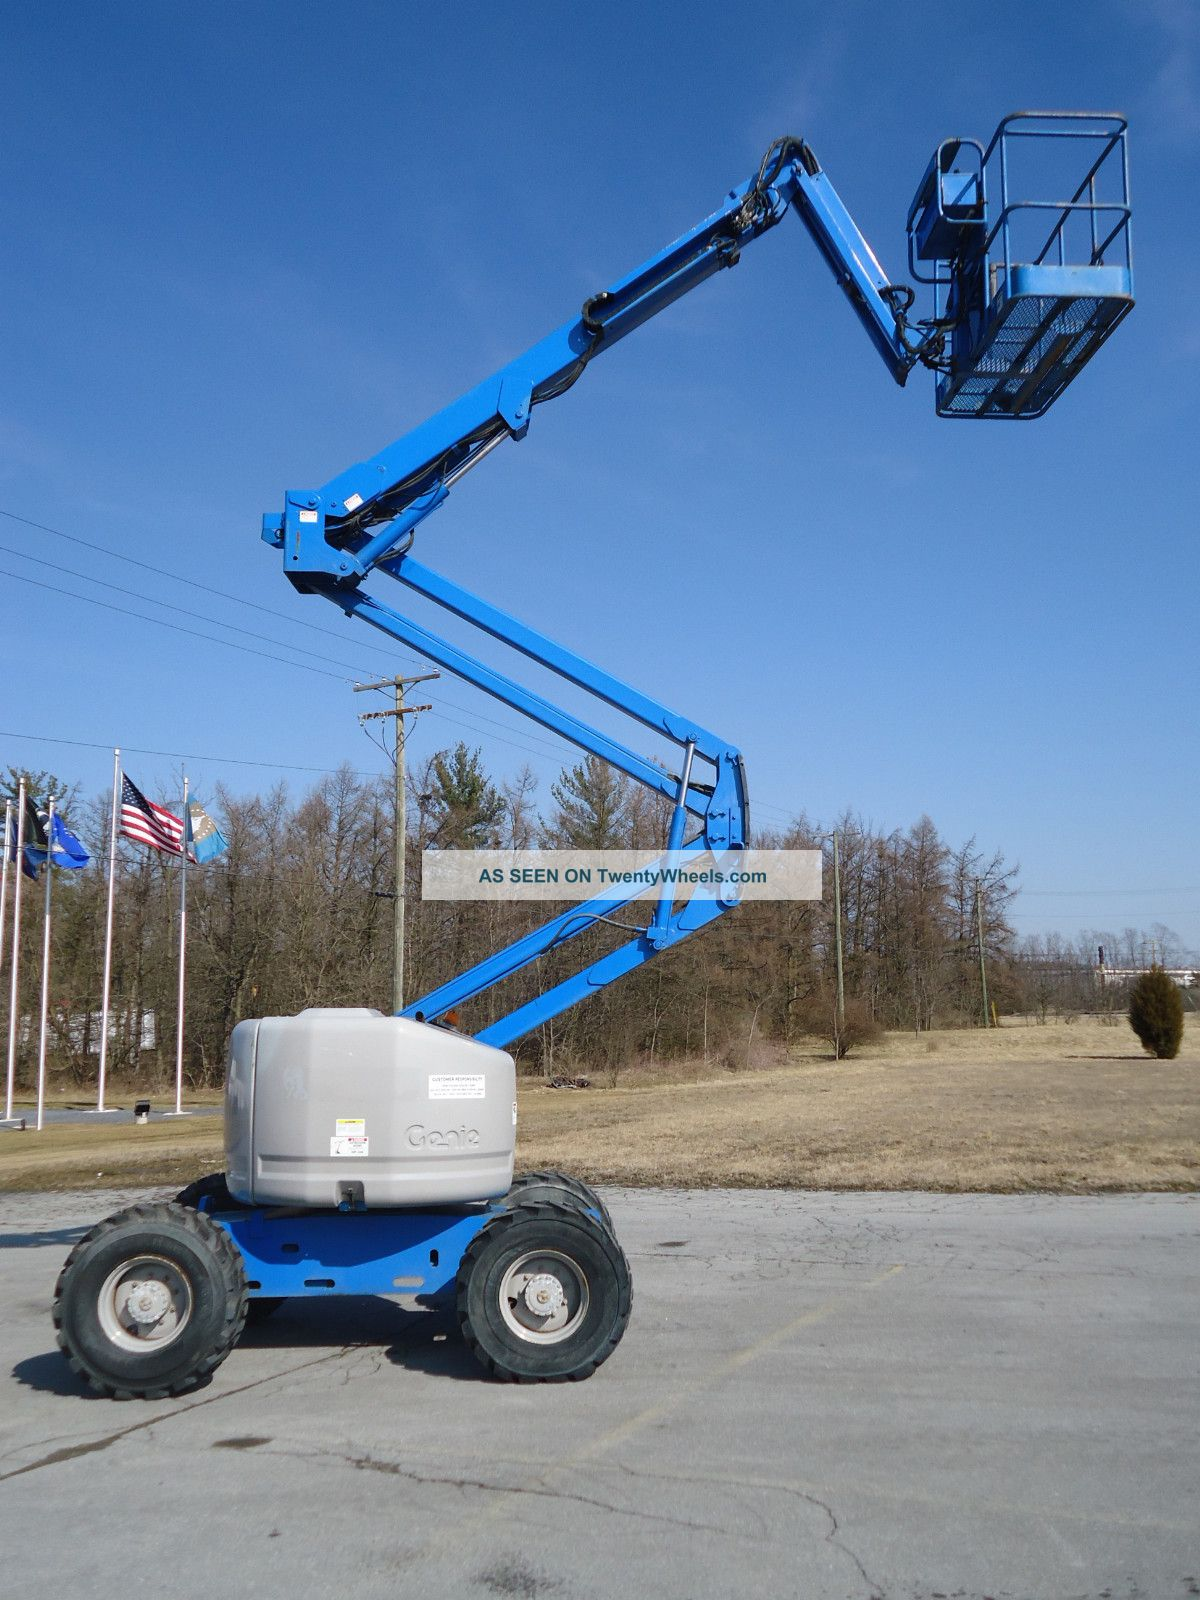 Genie Man Lifts : U haul self storage genie manlift